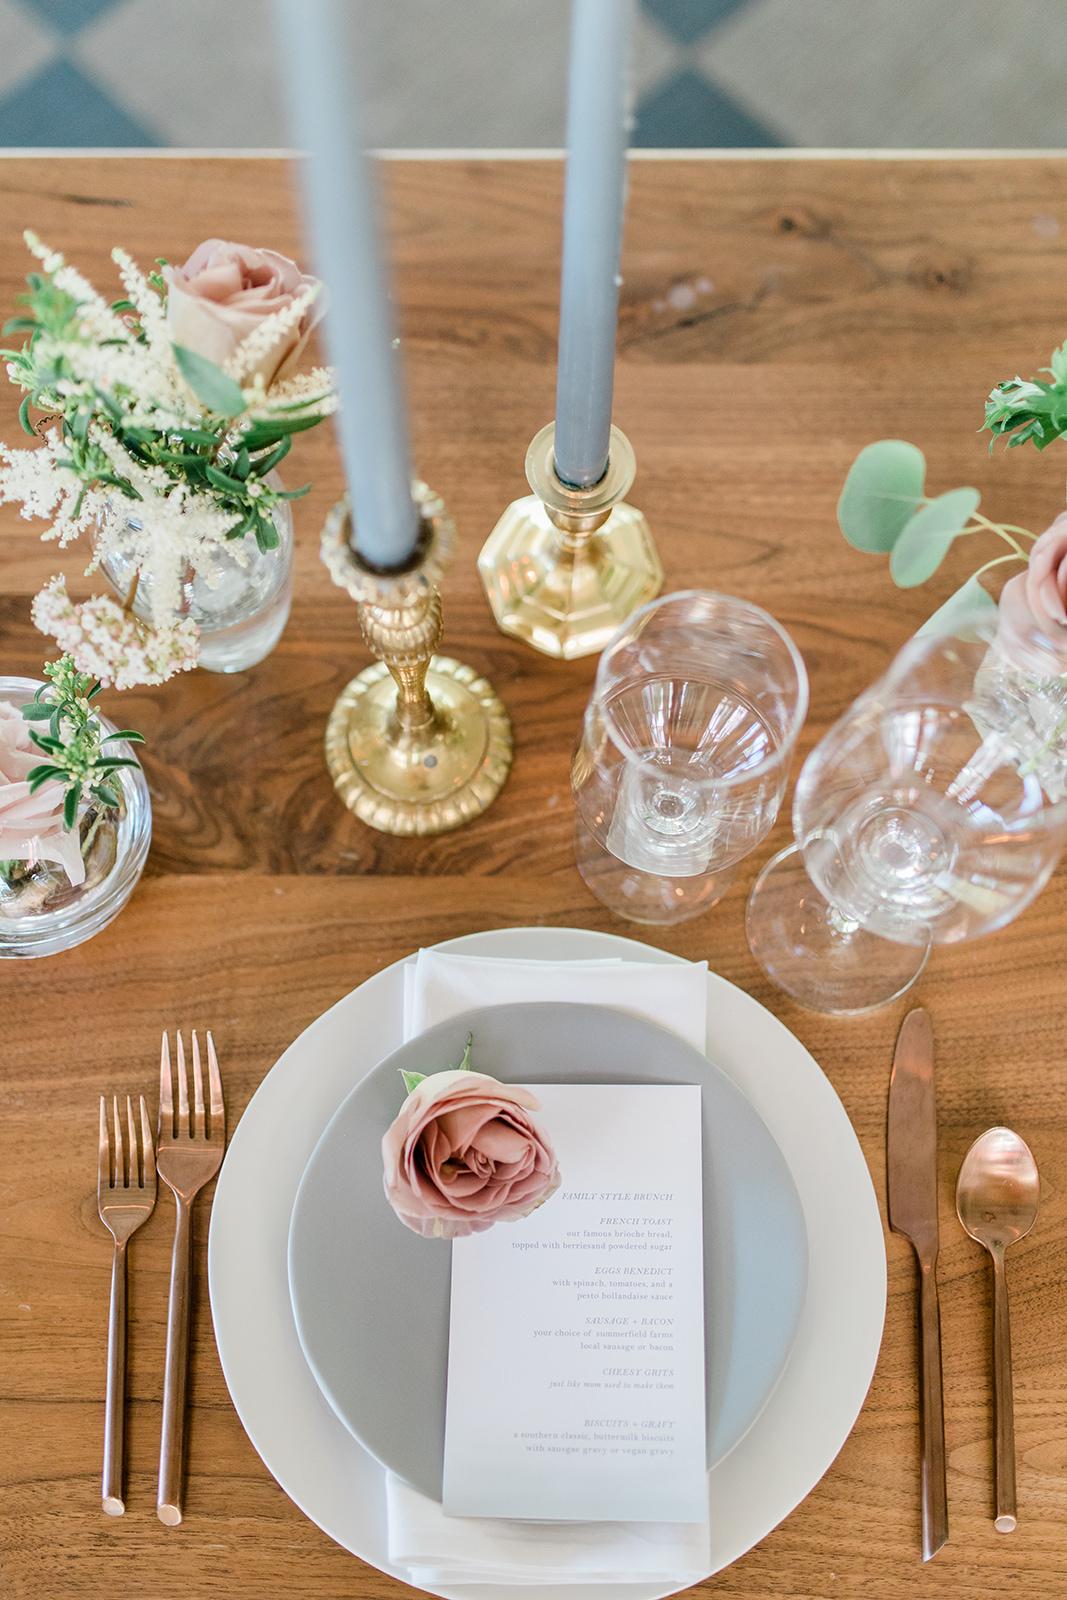 brunch wedding menu